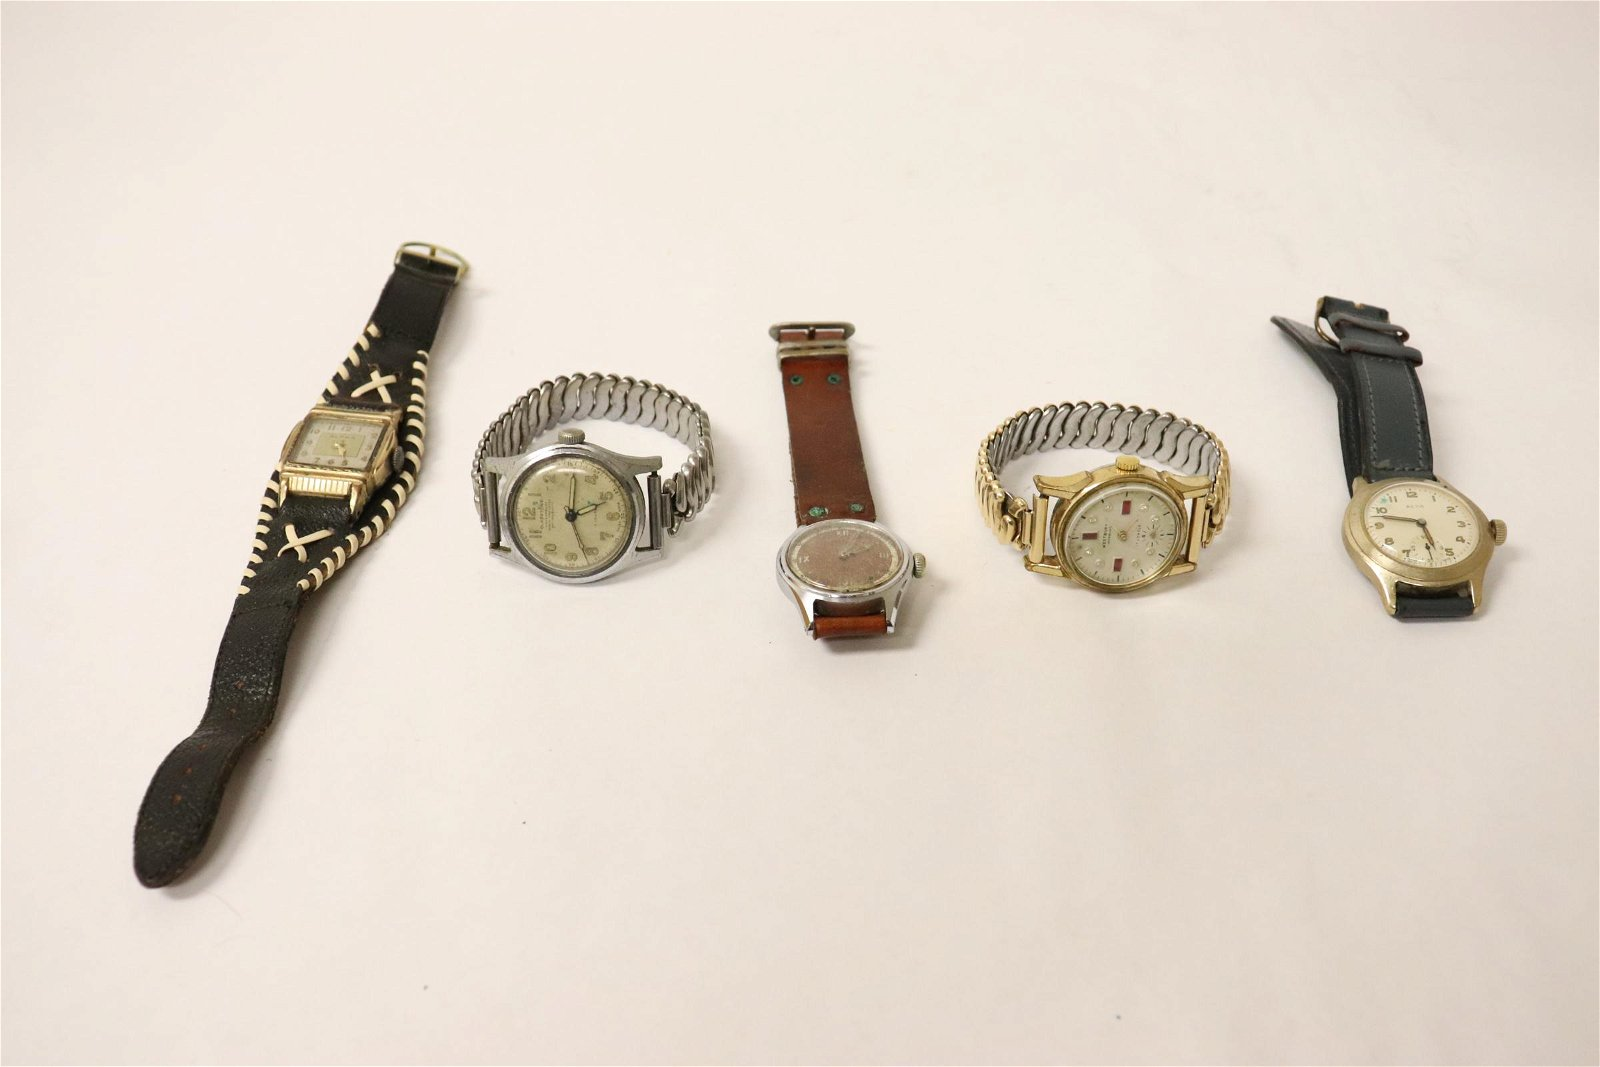 5 vintage watches